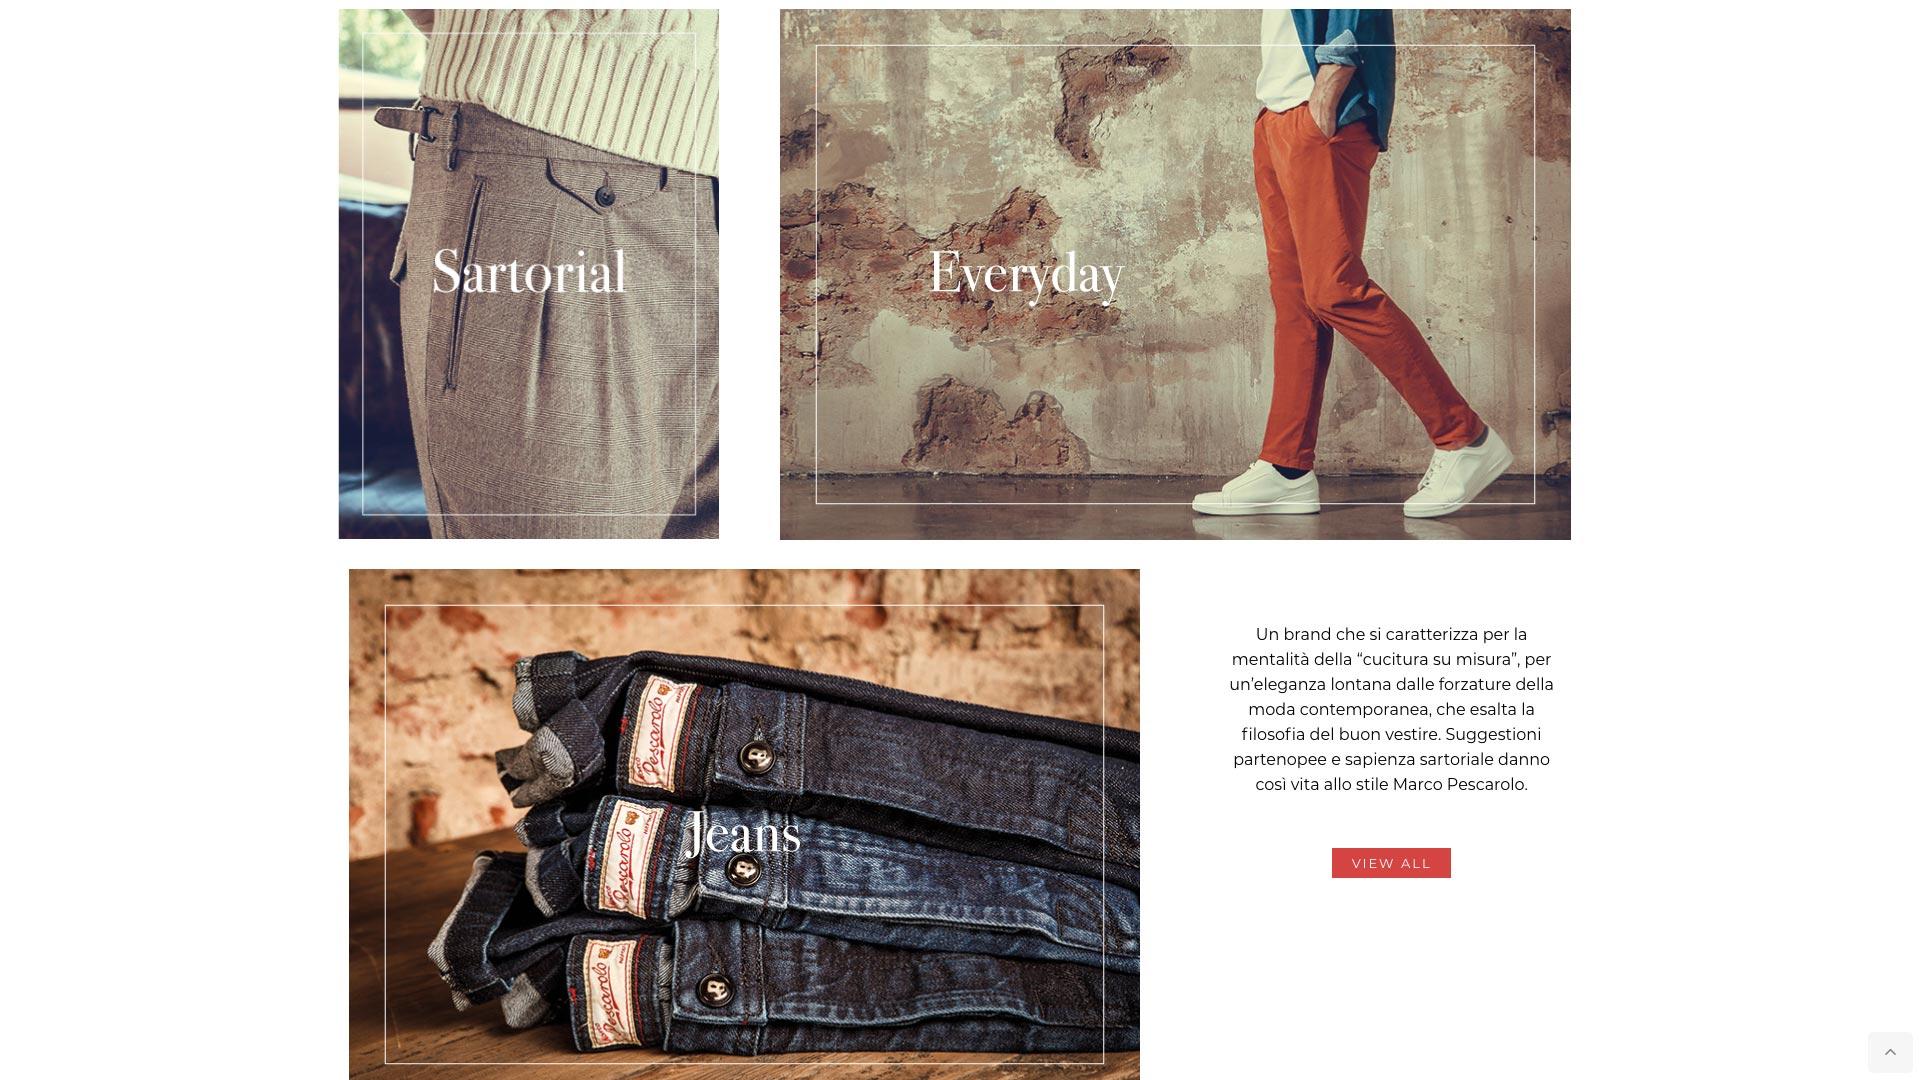 agnzia-comunicazione-napoli-roberto-guariglia-advertising-portfolio-work-fashion-marco-pescarolo-napoli-kiton-sartorio-pantaloni-sartoria-sito-web-2.jpg